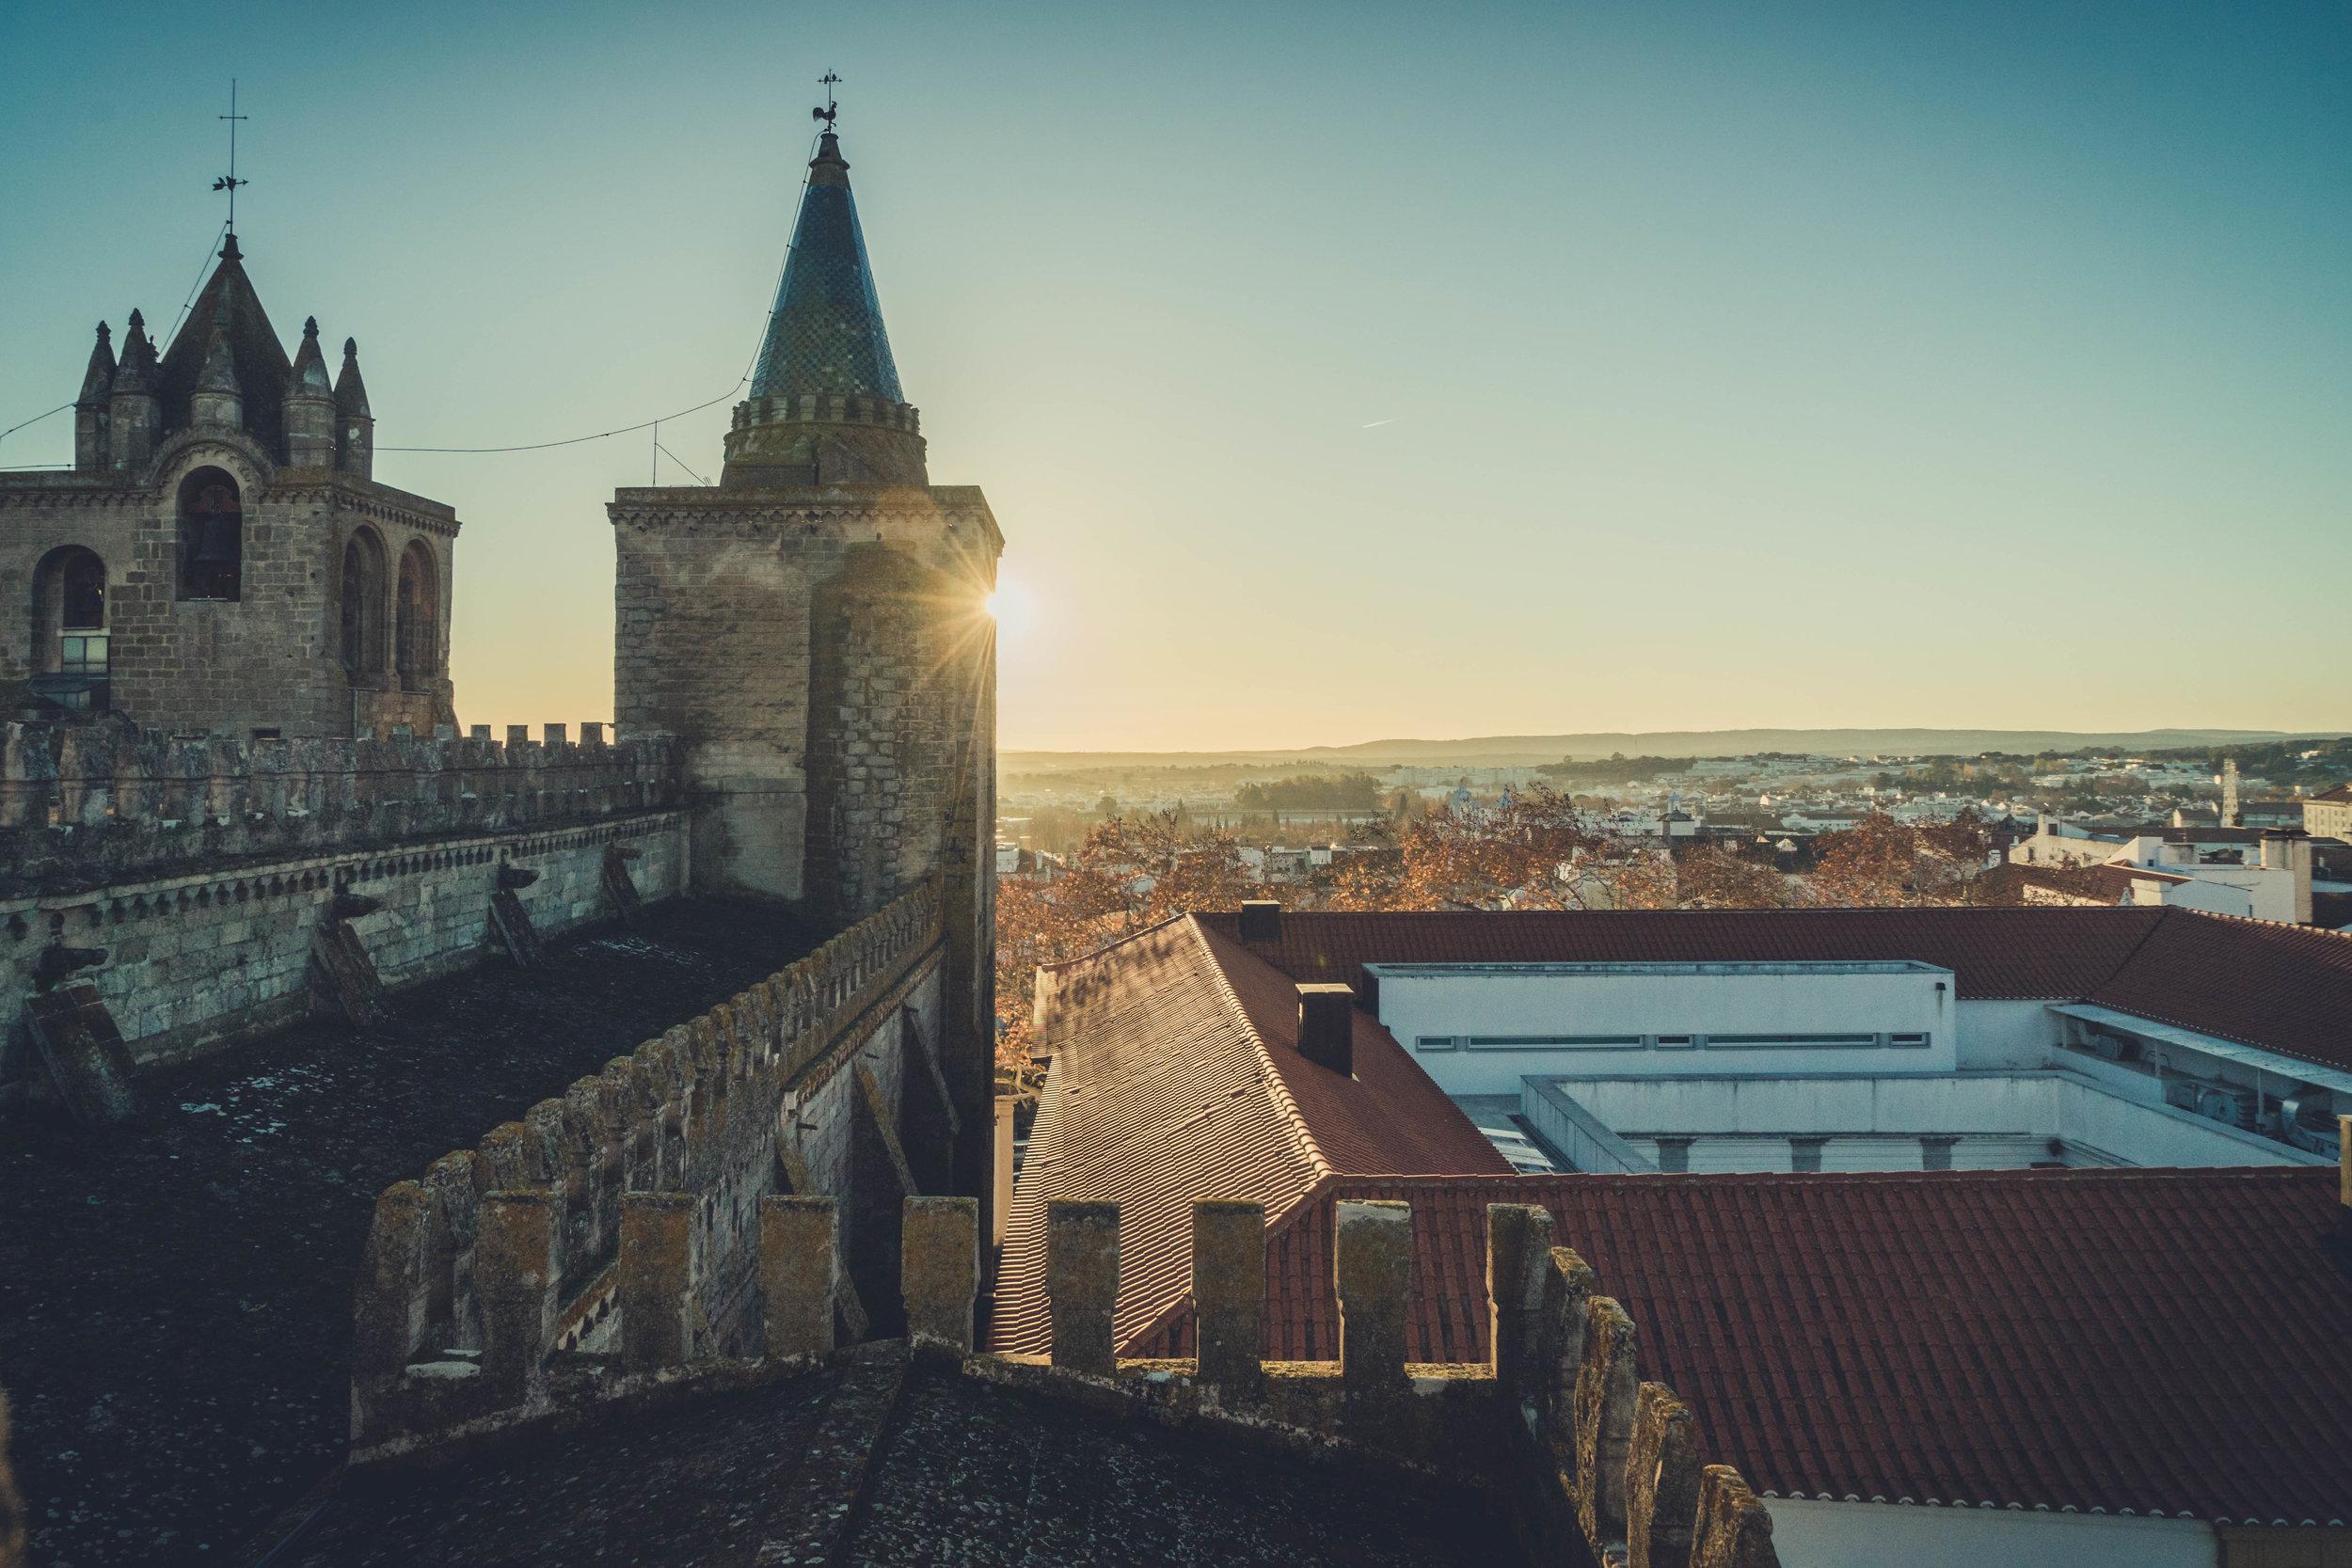 Evora. Roman Ruins. Portugal. Alentejo. Piliers. Roman city. ancient roman town. Blue sky. travel. adventure. history. historical. wine. architecture. sunlight. sunset.jpg